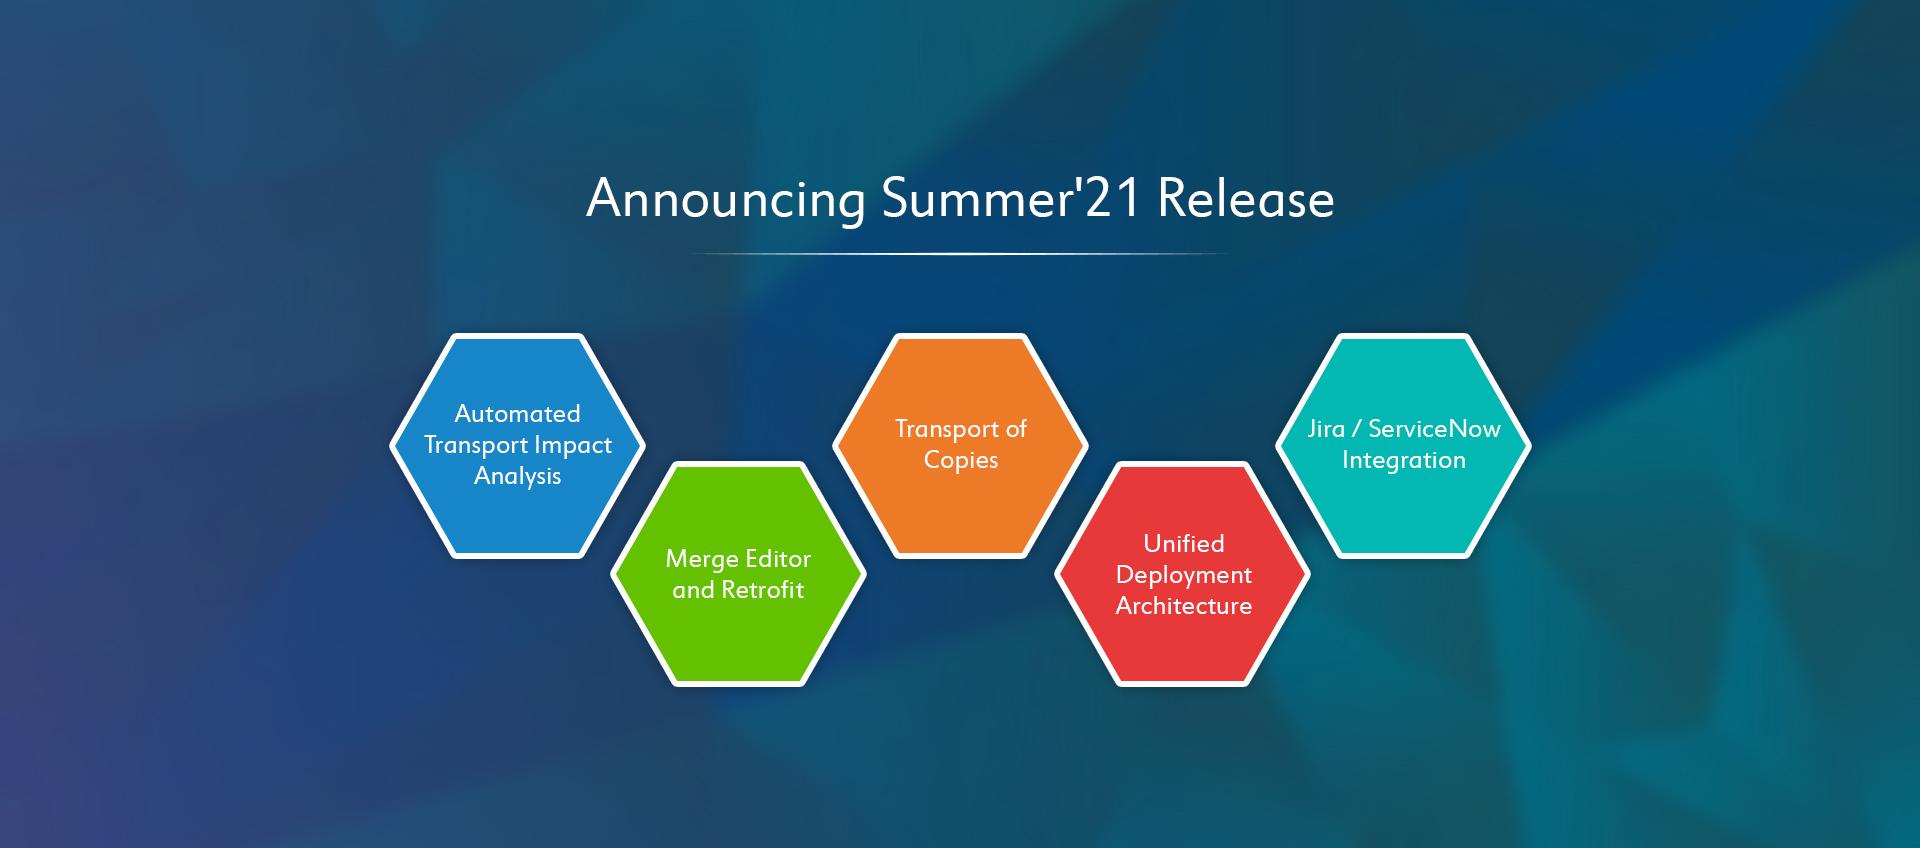 Announcing Summer'21 Release